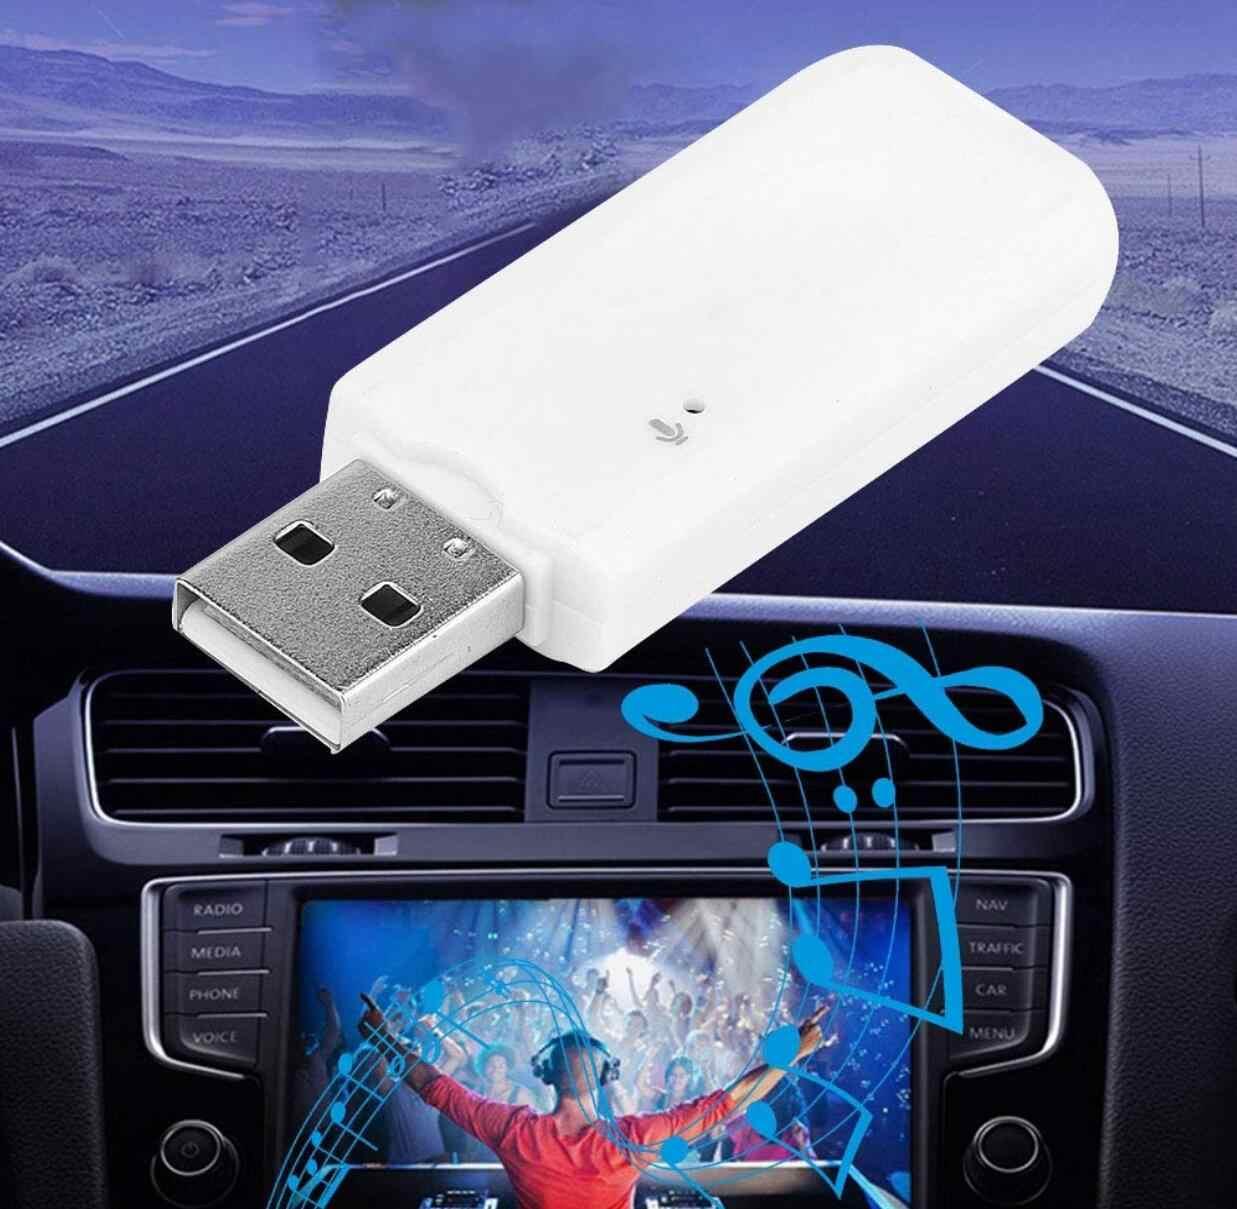 Usb Bluetooth Audio Penerima Nirkabel Adapter untuk Radio 2 DIN Android Volvo V70 BMW E61 Skoda Cepat Fiat Bravo Subaru